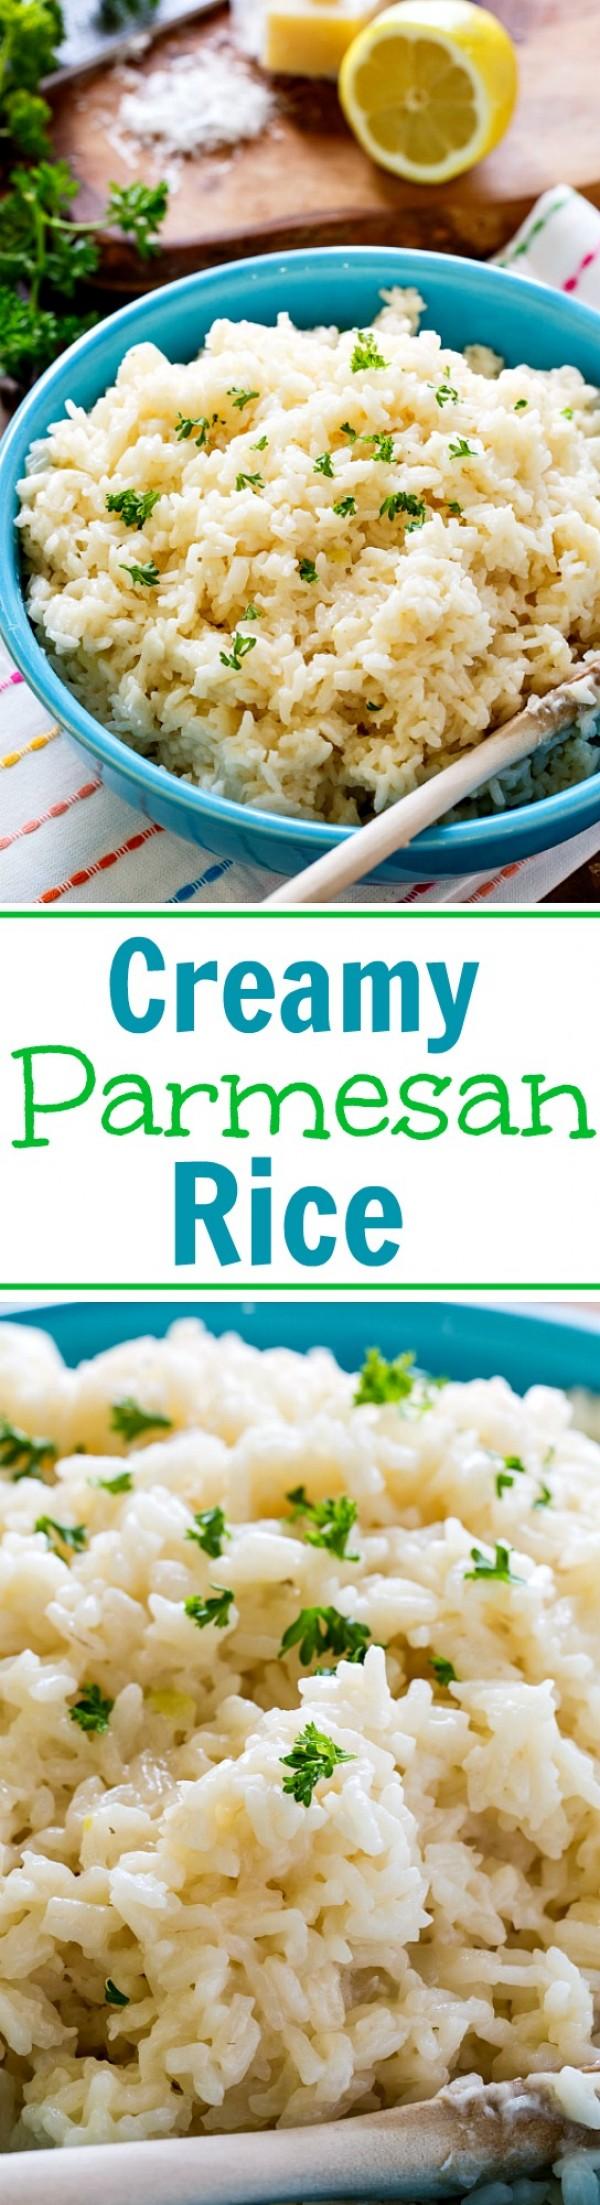 Get the recipe Creamy Parmesan Rice @recipes_to_go